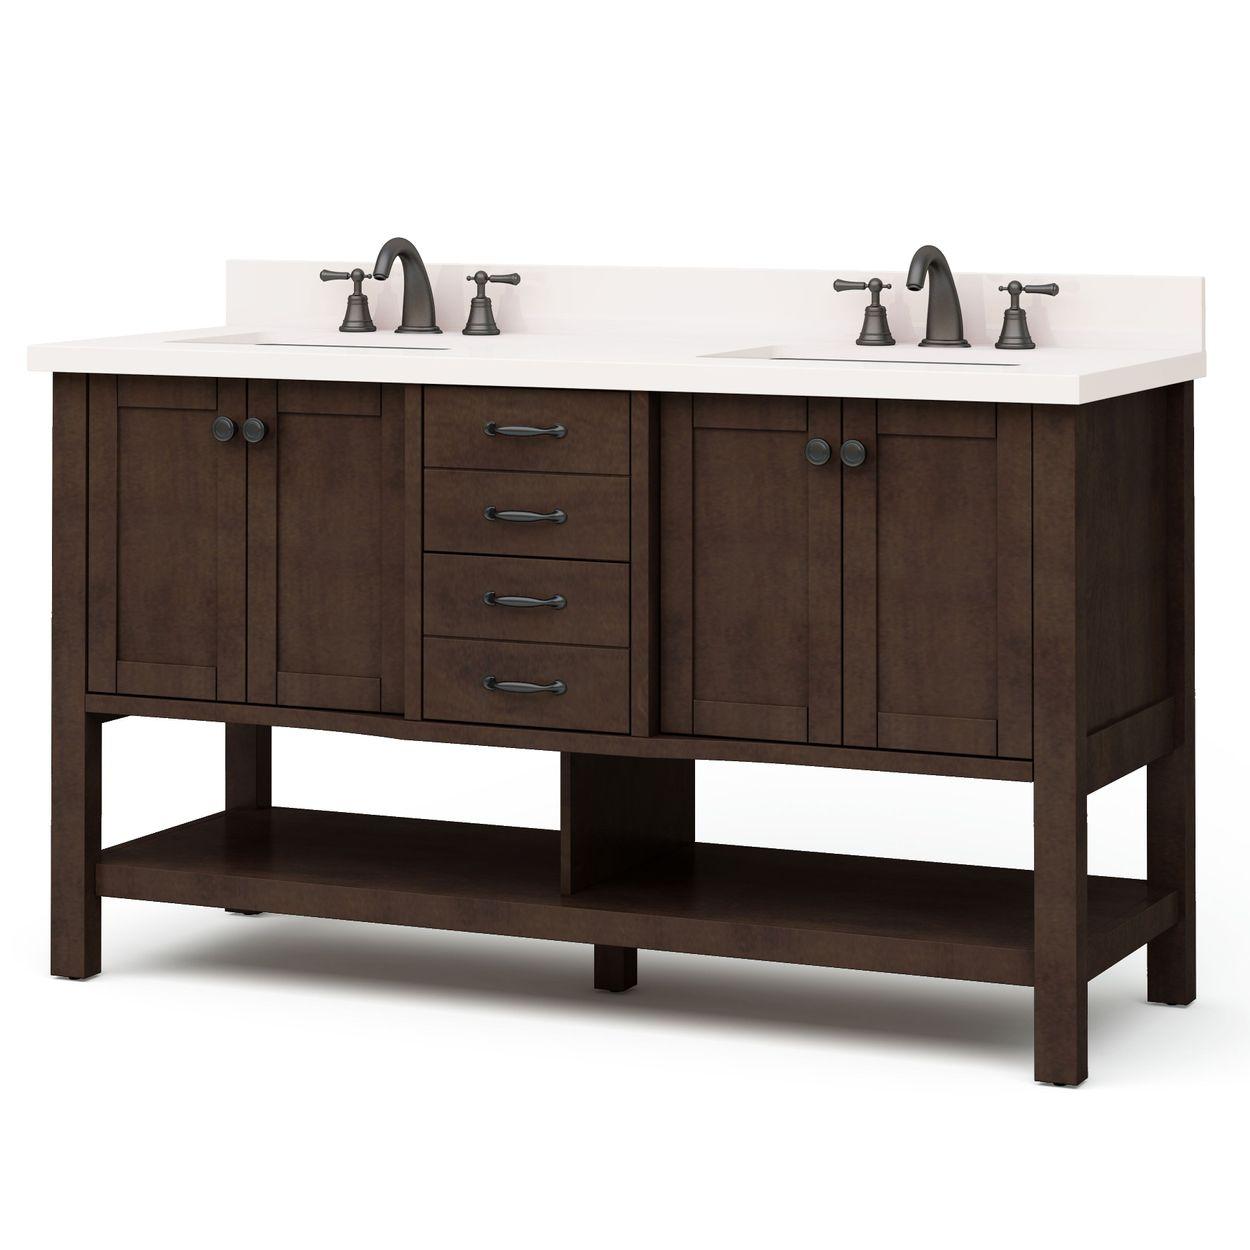 allen roth kingscote 60 in espresso double sink bathroom vanity with espresso engineered stone top